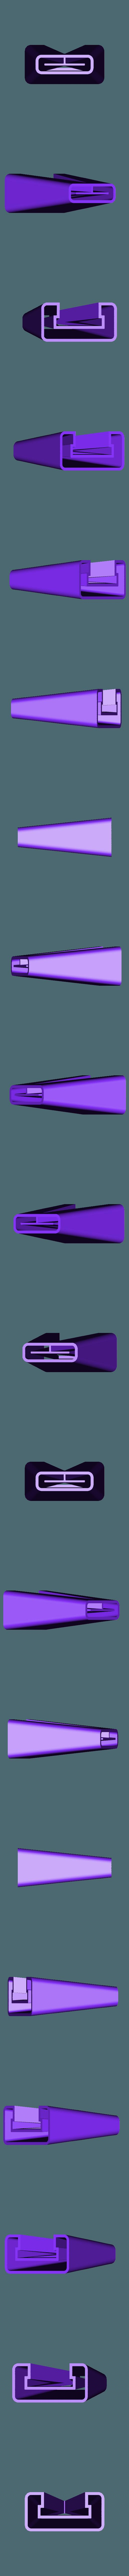 3.5cm_BiasTape_minimalistic_Q2.stl Download free STL file 3cm / 3.5cm / 4cm / 5cm Simple Bias Tape Maker, zakladac pasku • 3D printable template, ongaroo